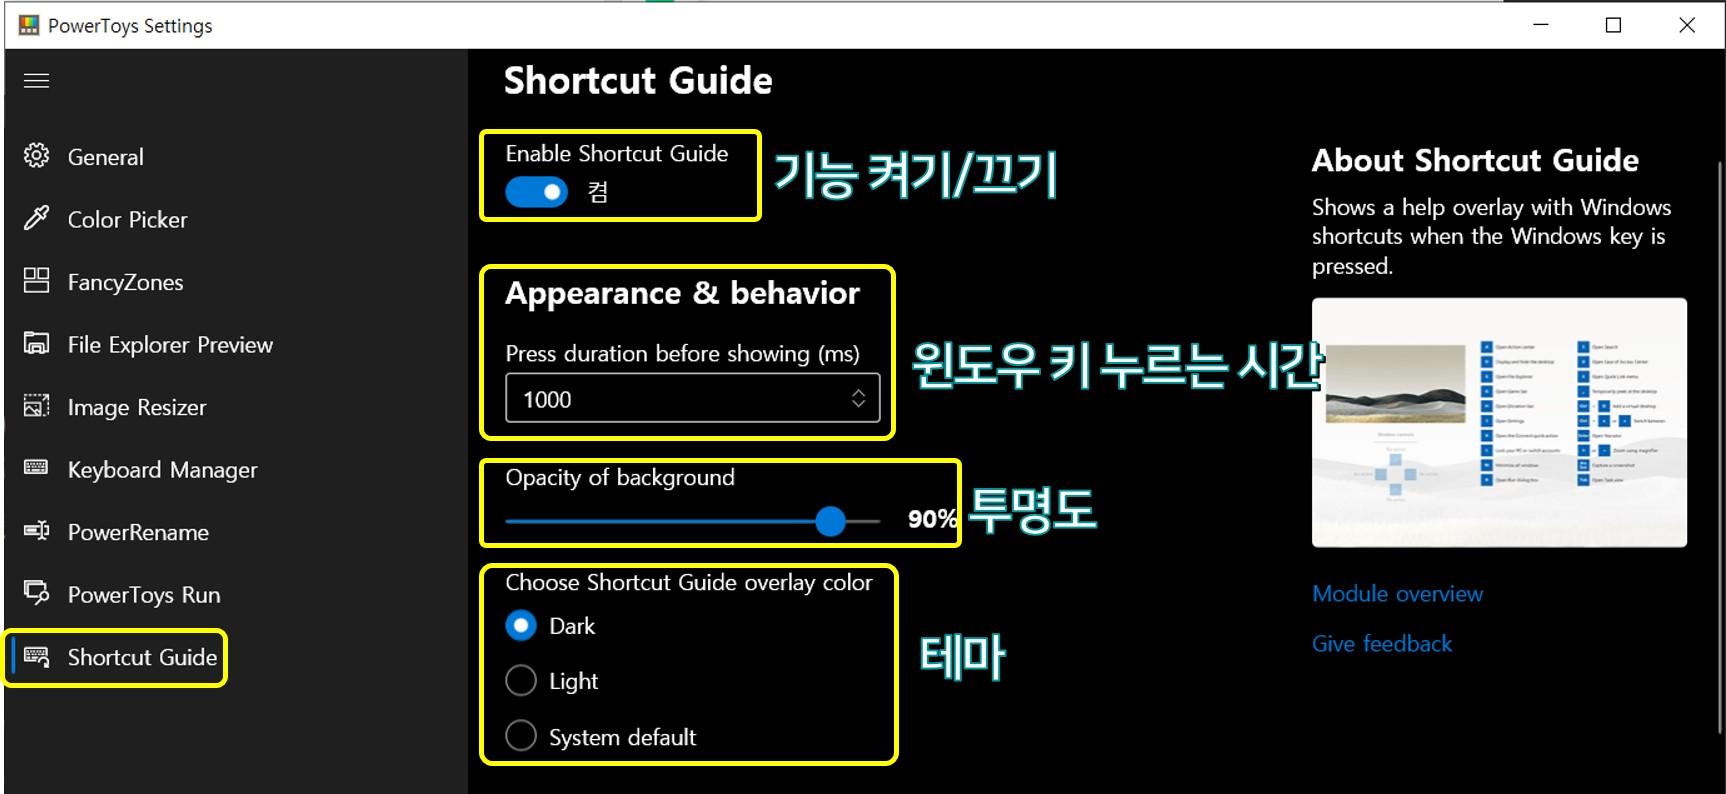 PowerToys : Shortcut Guide 세부 설정